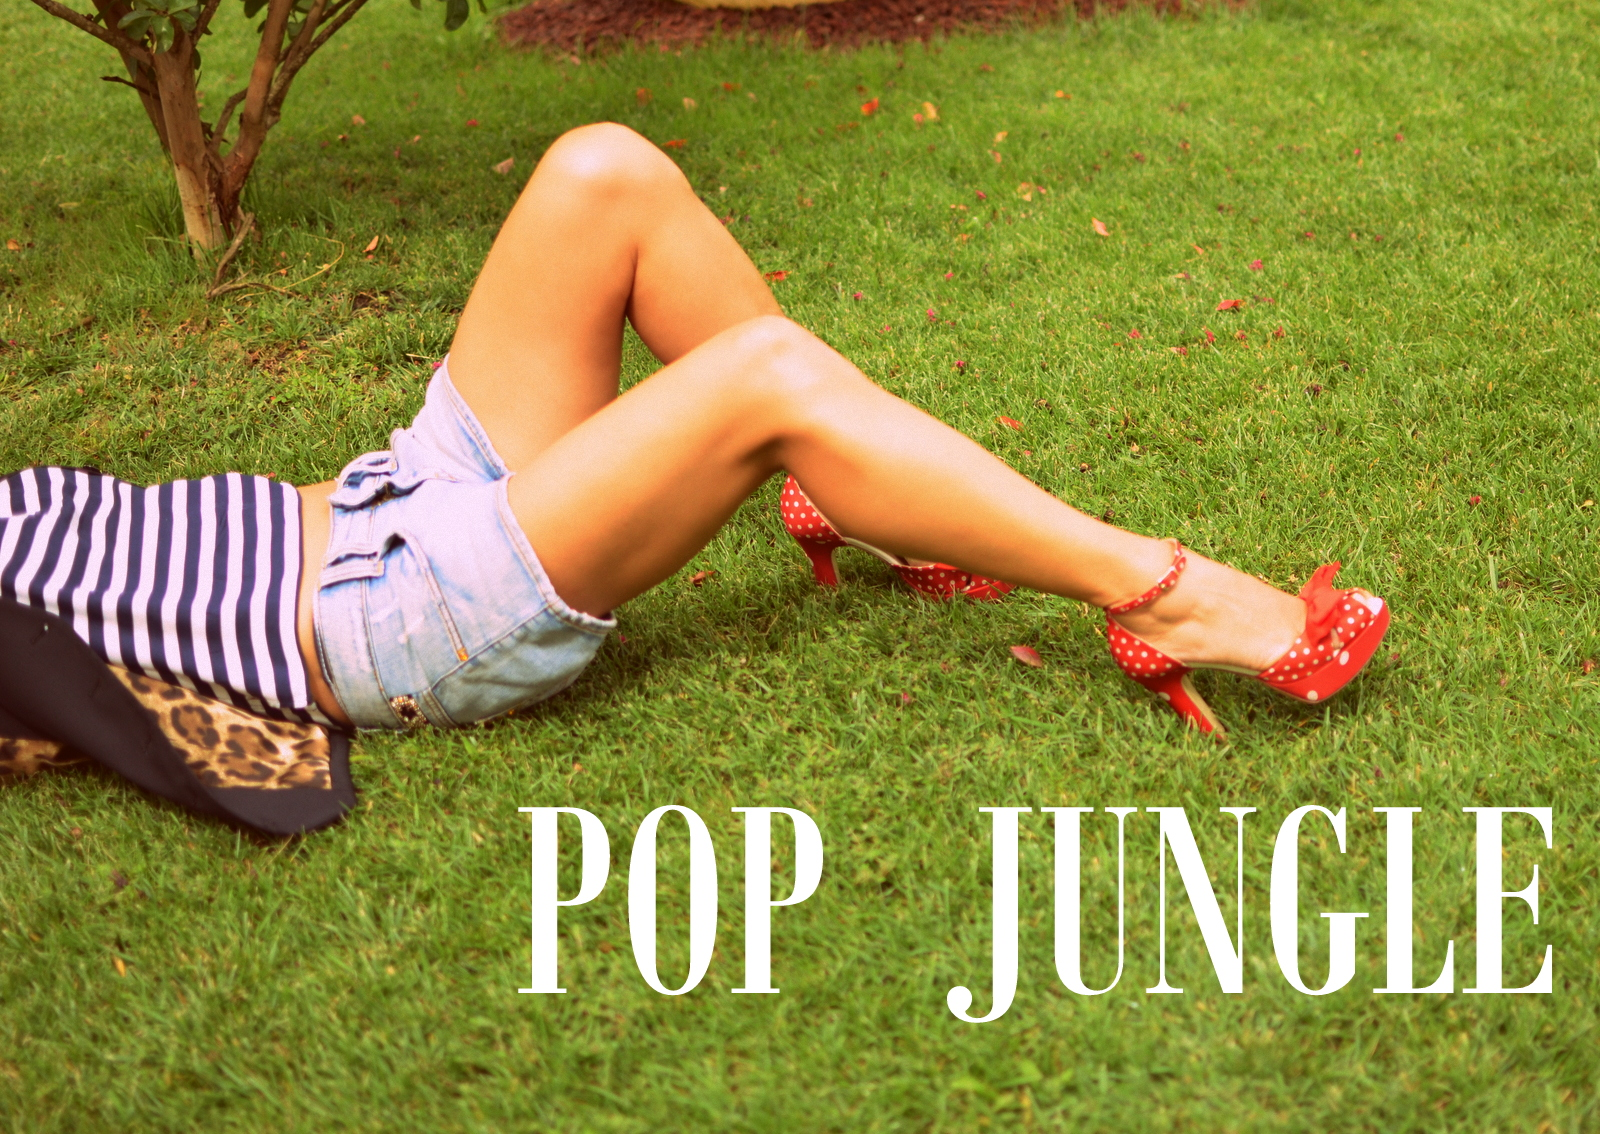 pop jungle (2)